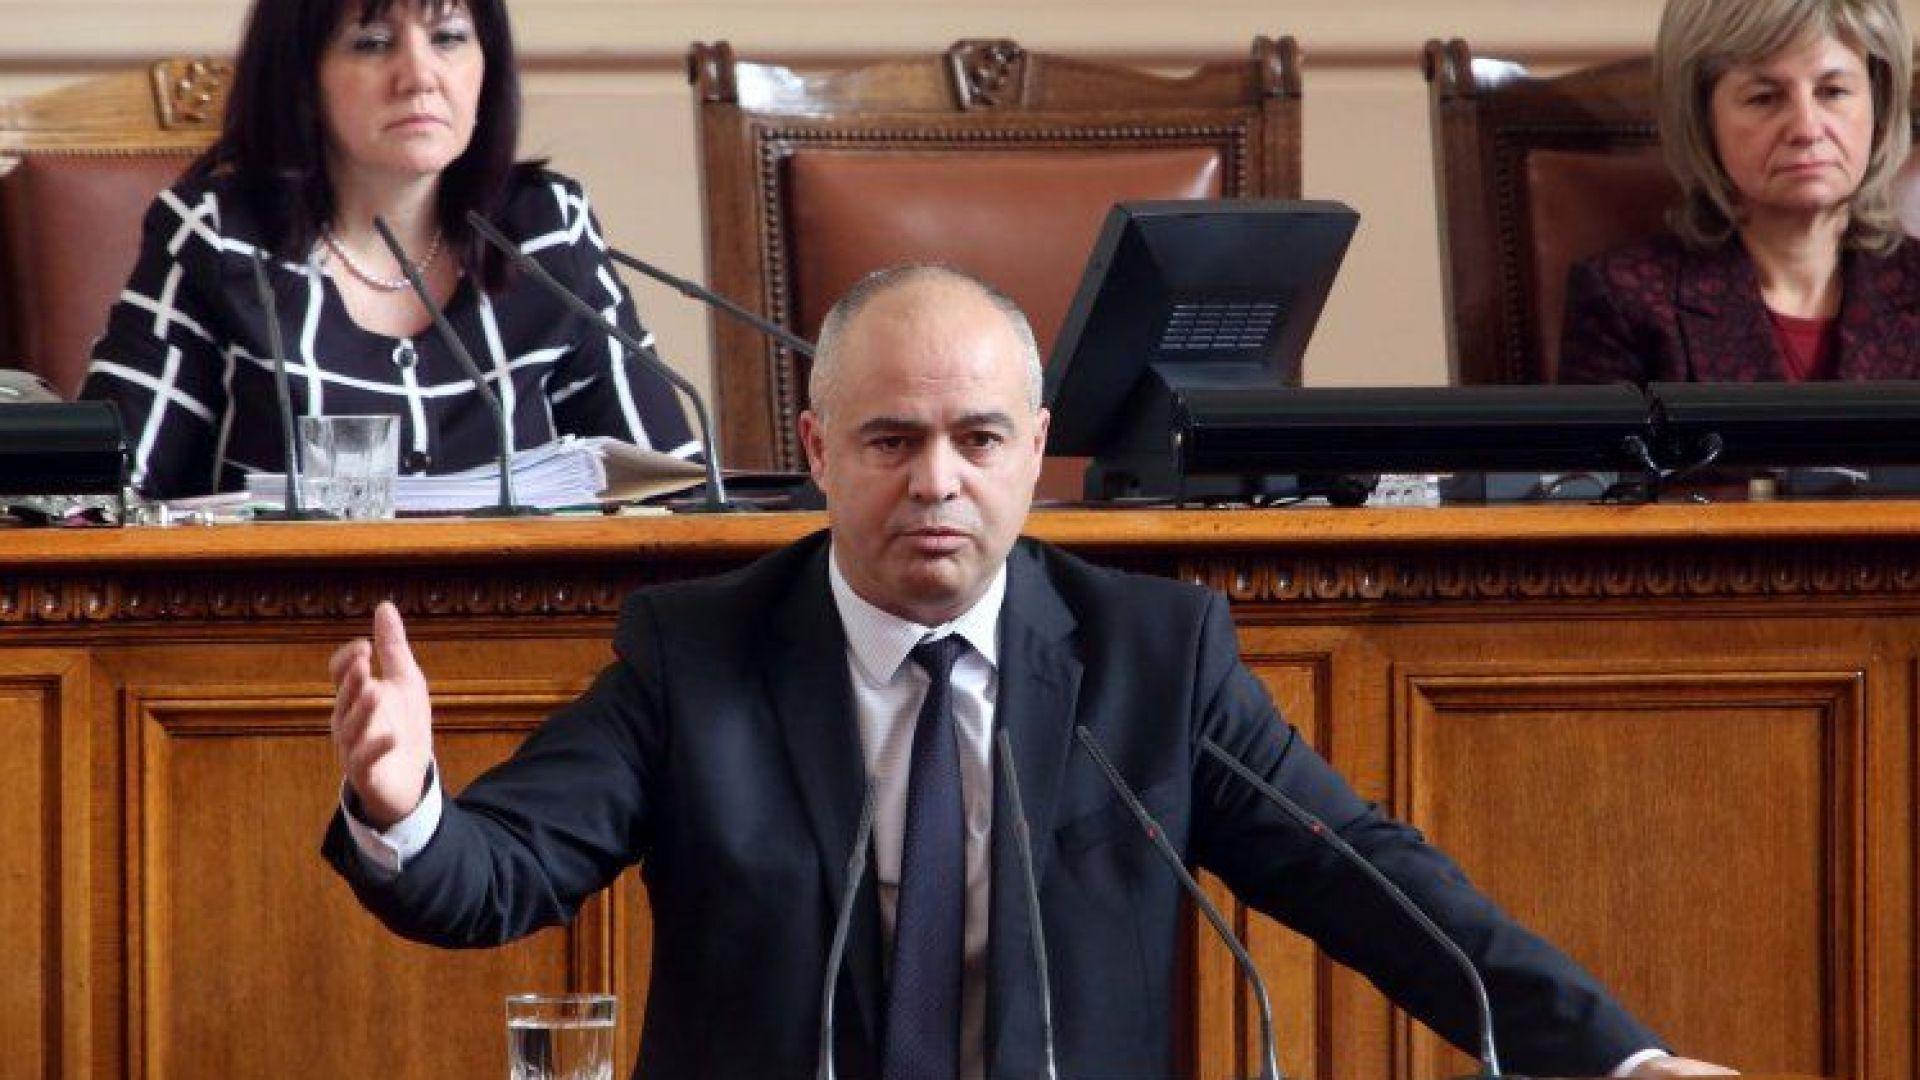 Георги Свиленски обвини в лъжа Цветан Цветанов